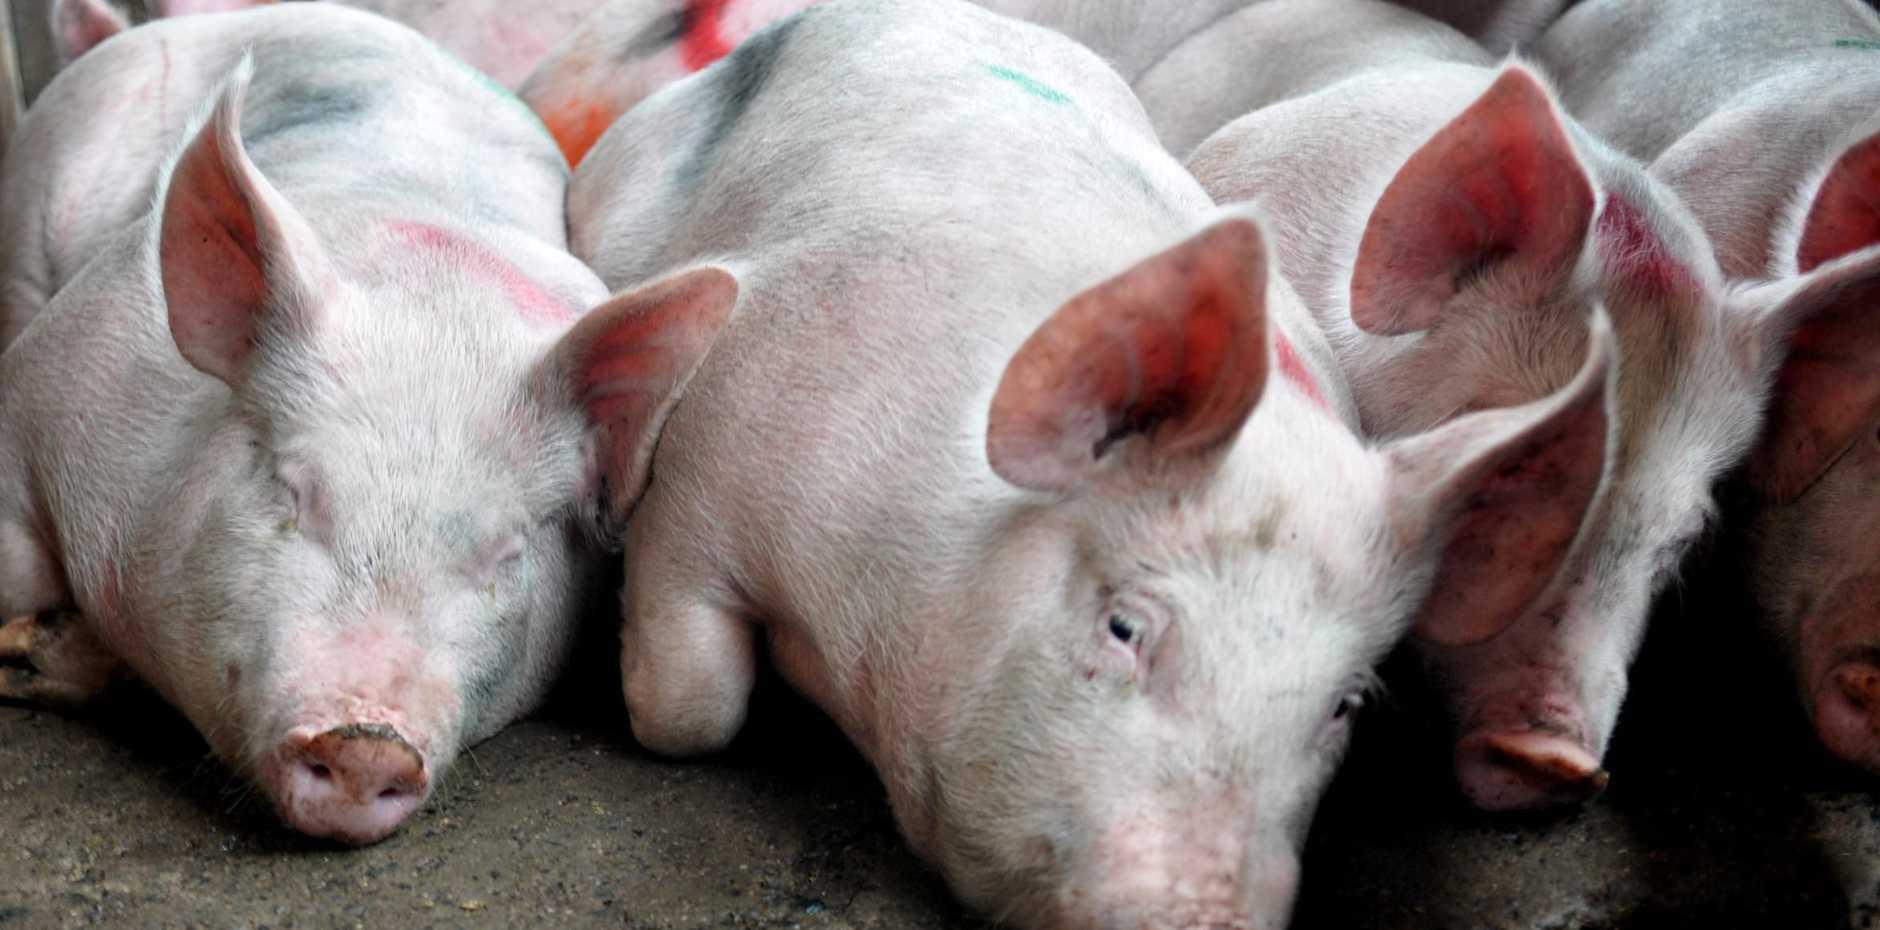 LIVESTOCK TRANSPORT: Animal activism groups block trucks en route to abattoirs